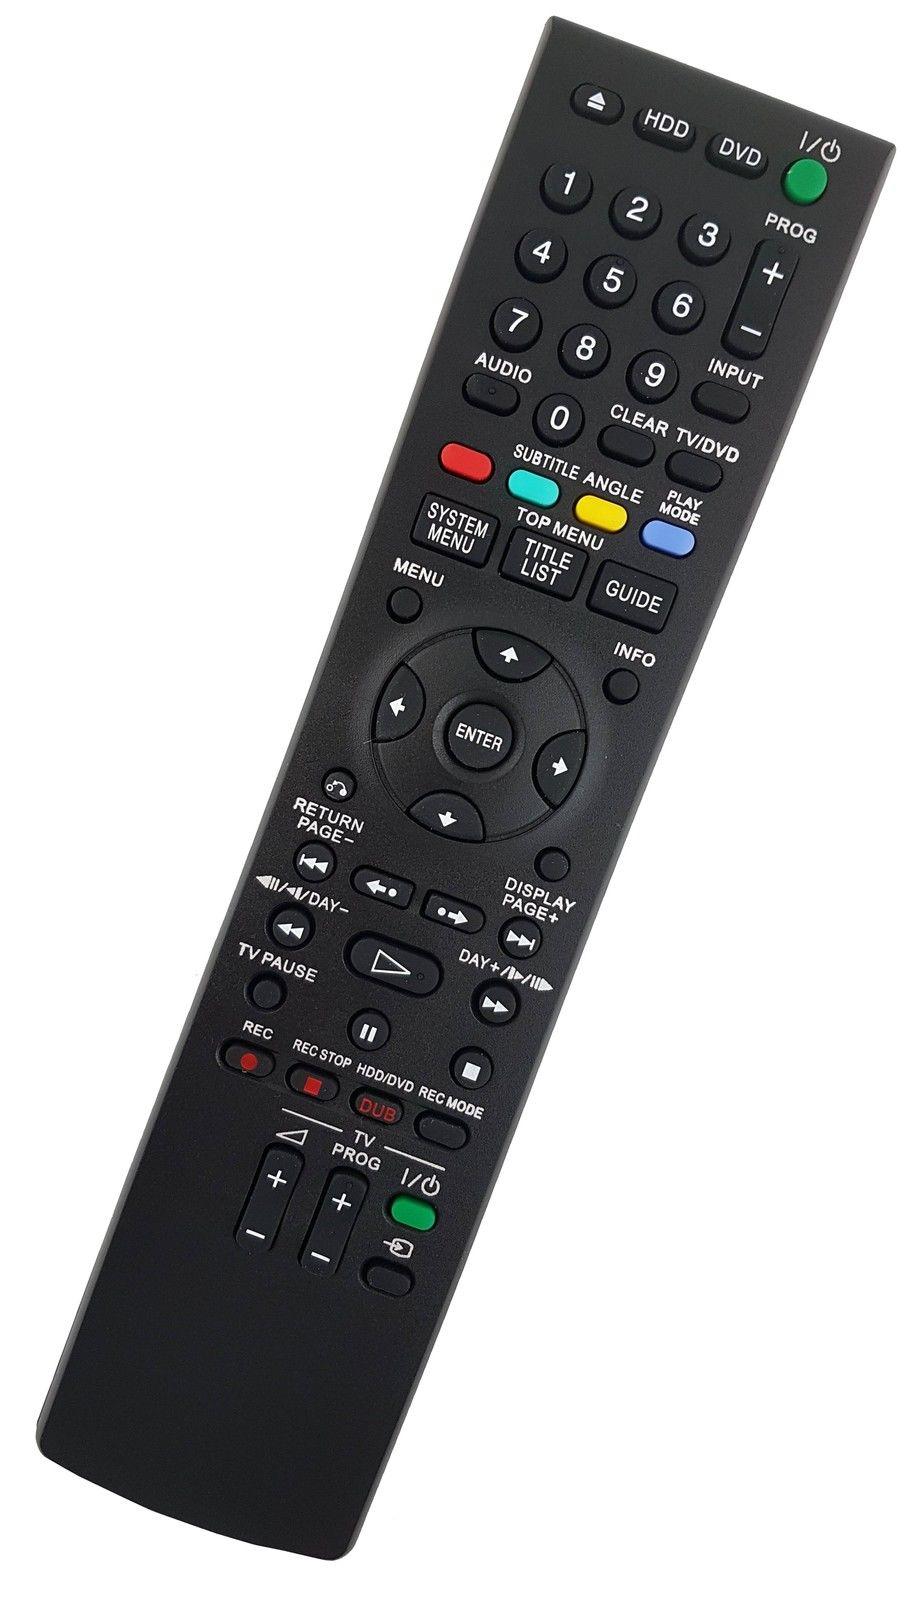 Пульт дистанционного управления для Sony HDD RMT-D259 для жесткого диска рекордер SVR-HDT1000 SVR-HDT500